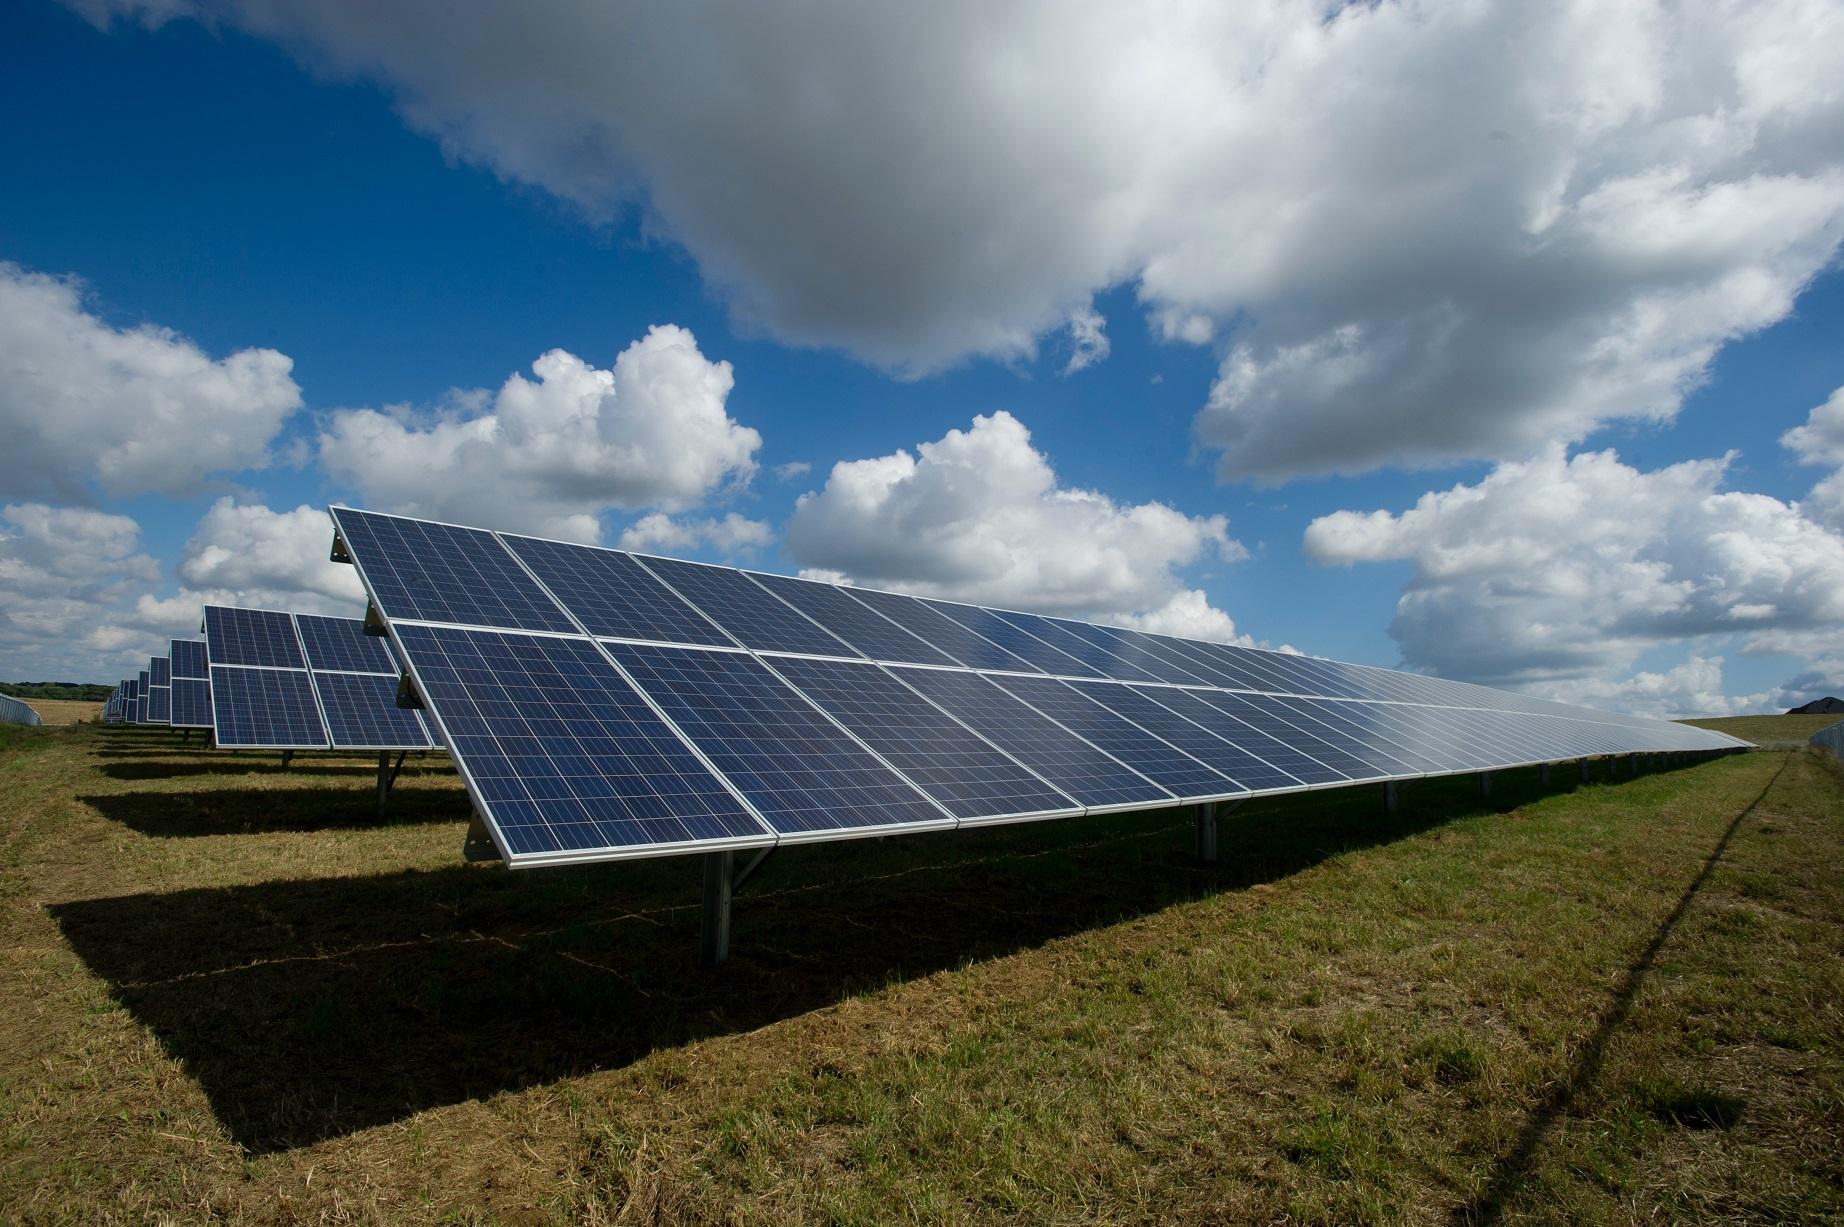 AleaSoft - Solar Panels